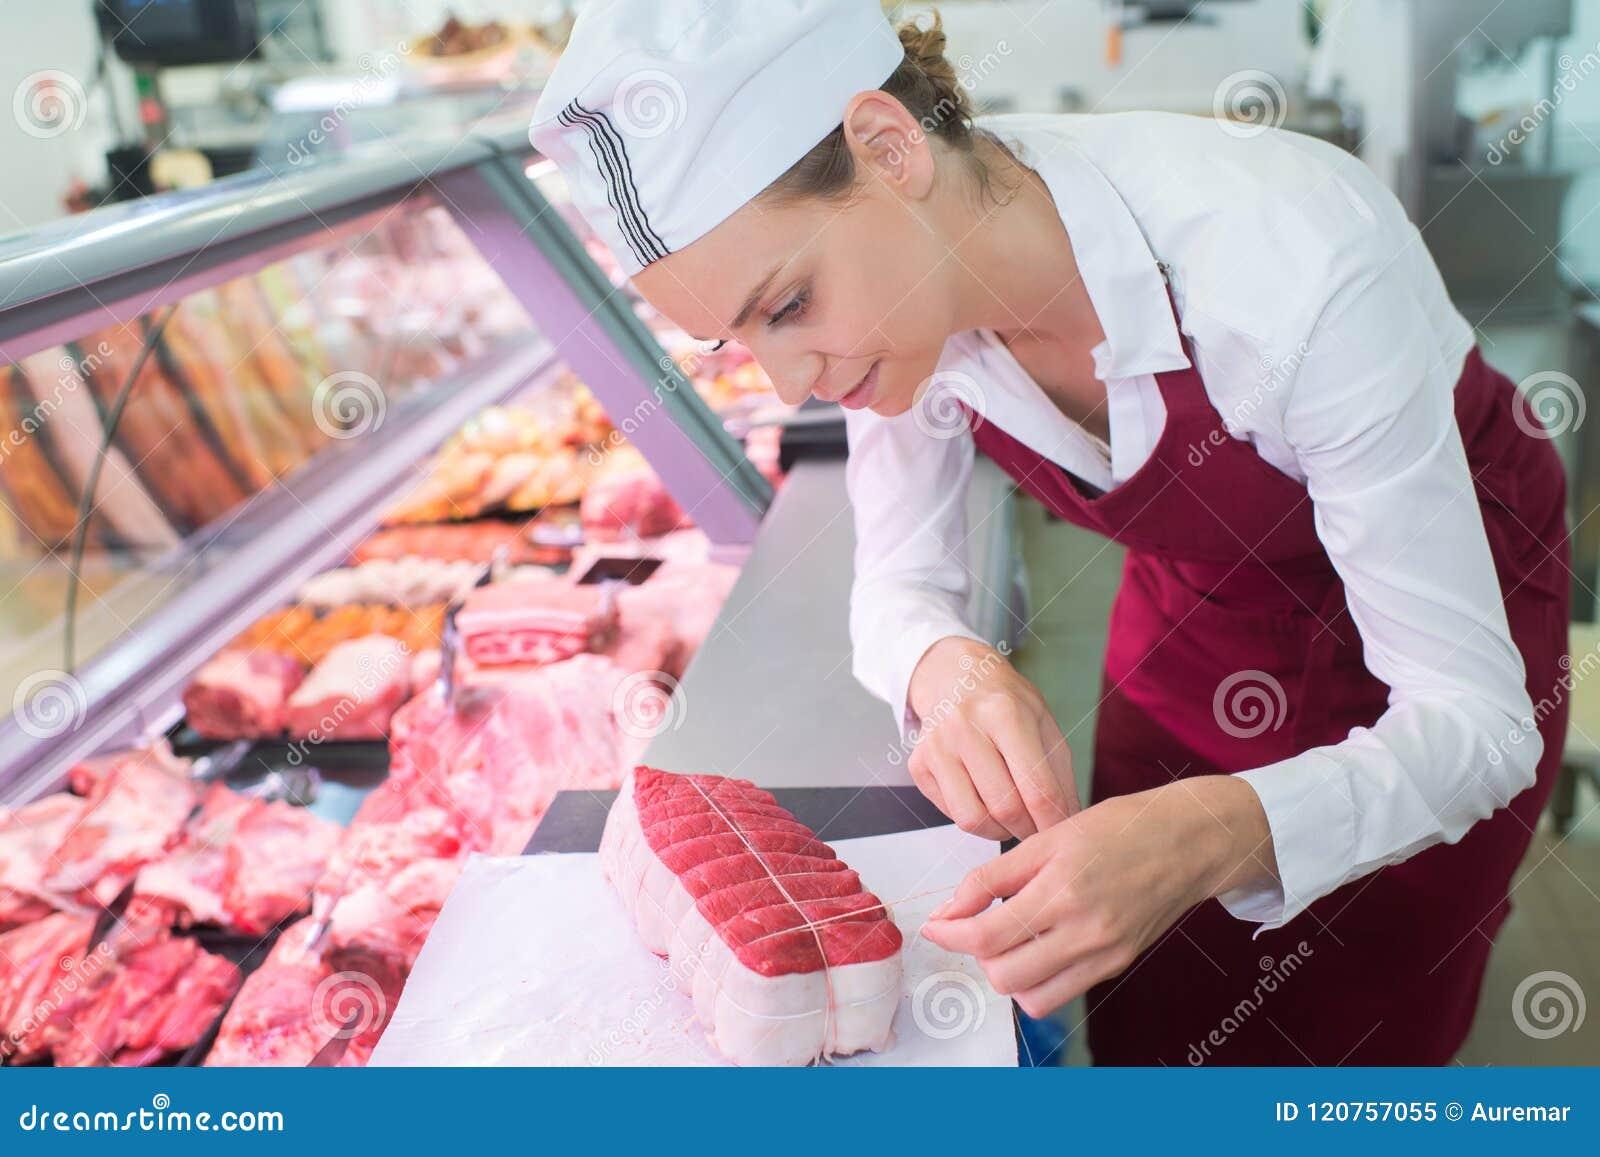 Female butcher preparing filet mignon